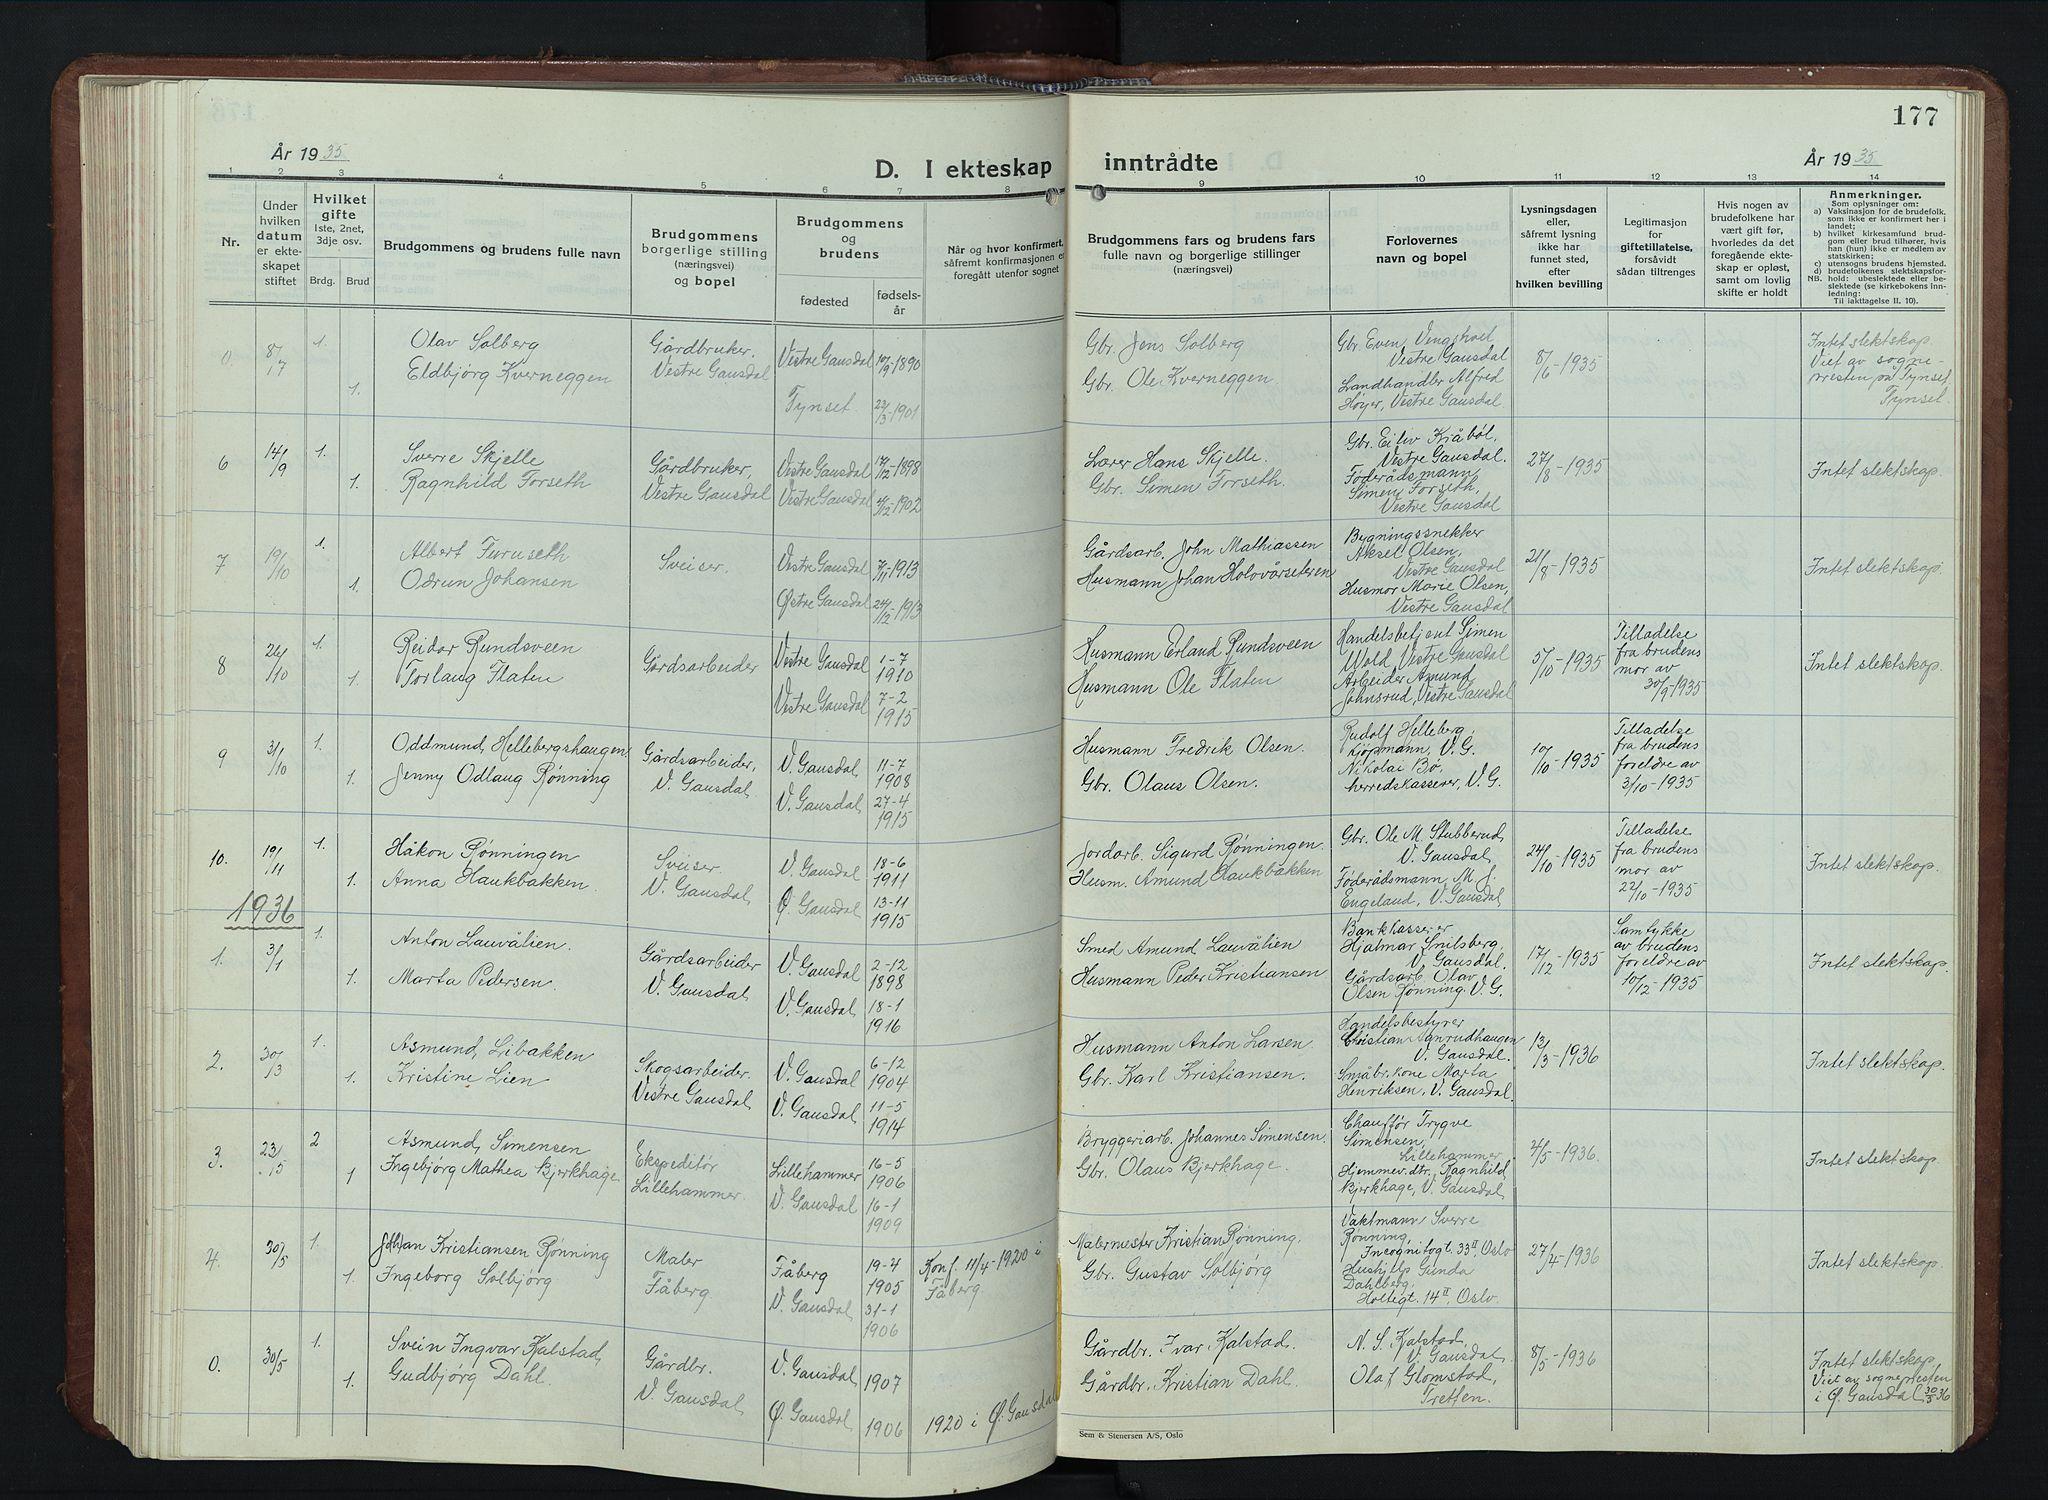 SAH, Vestre Gausdal prestekontor, Klokkerbok nr. 5, 1926-1955, s. 177